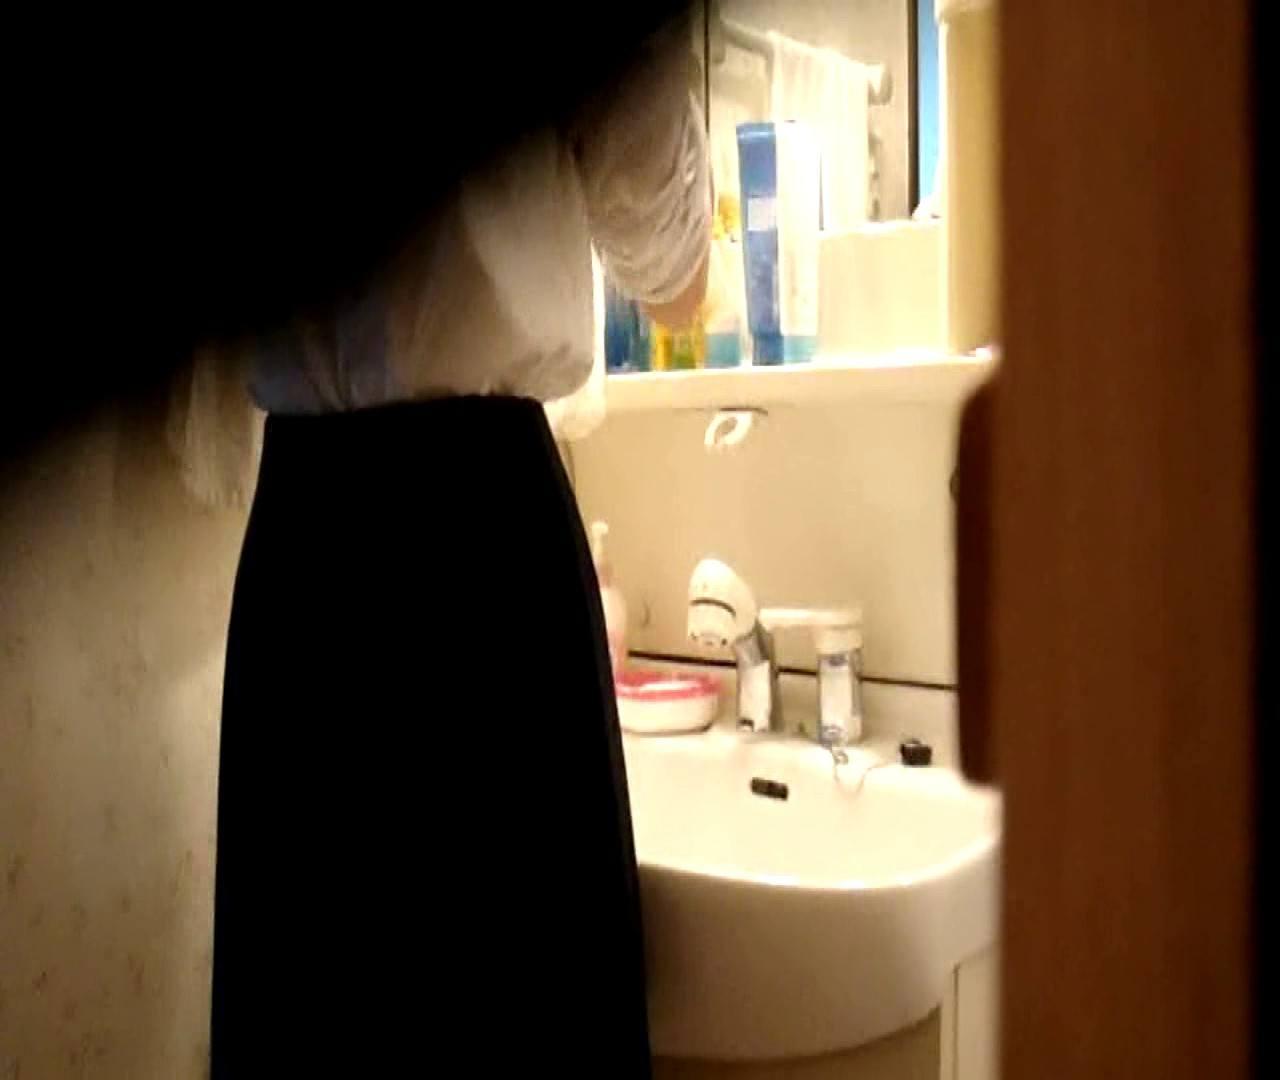 vol.5 まどかが帰宅後の洗顔後にブラを洗ってます。 ギャル達  112枚 64